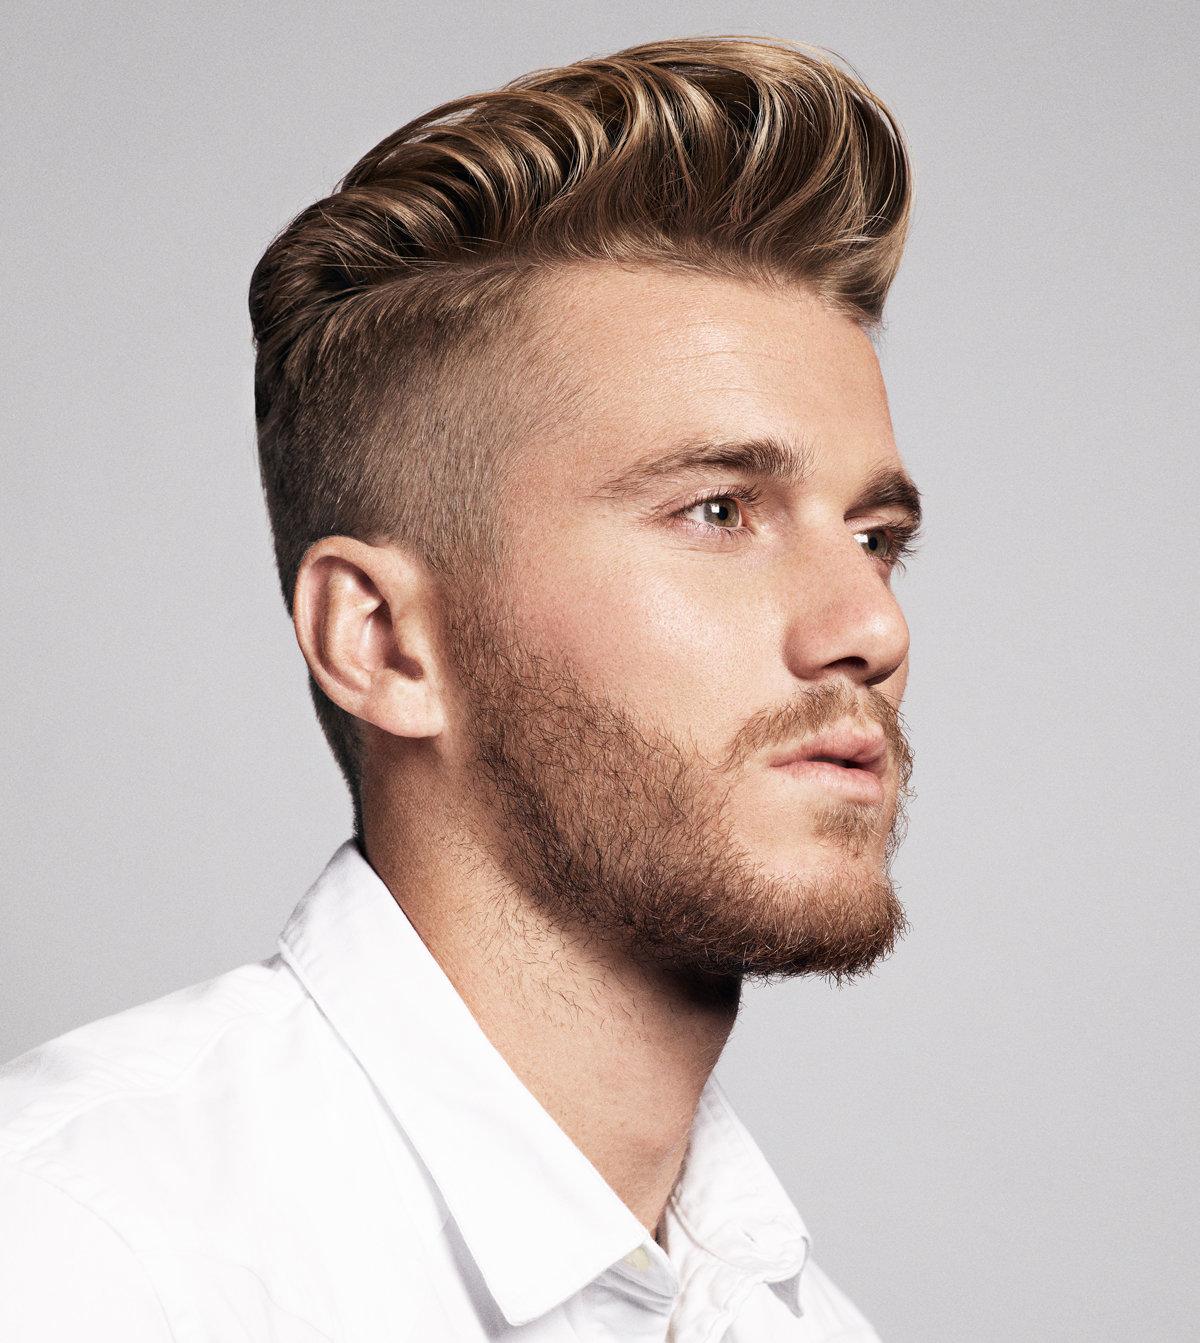 Картинки волос мужские